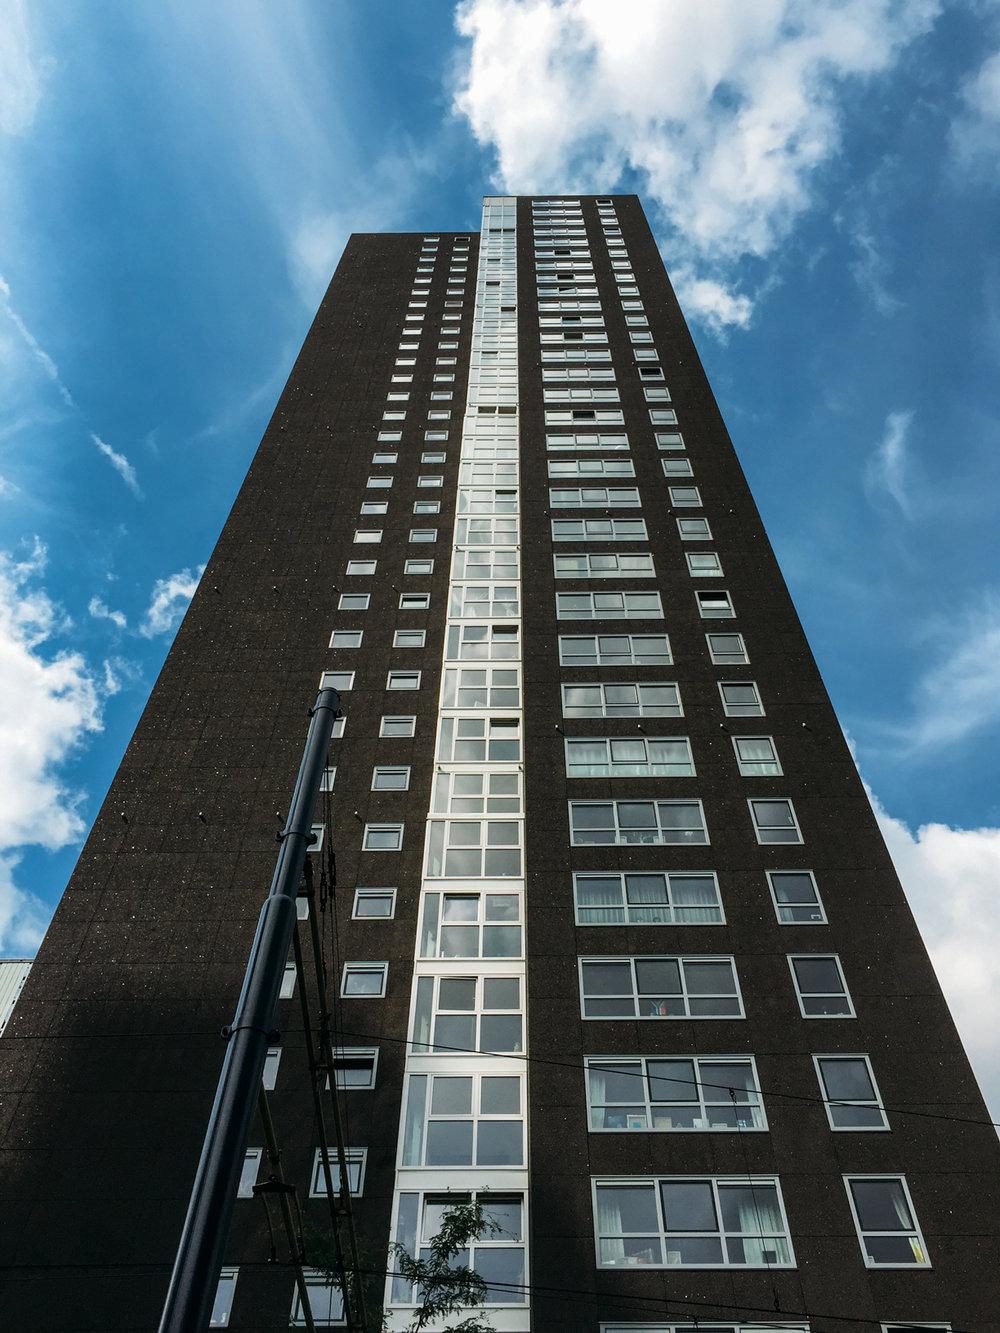 rotterdam-architecture